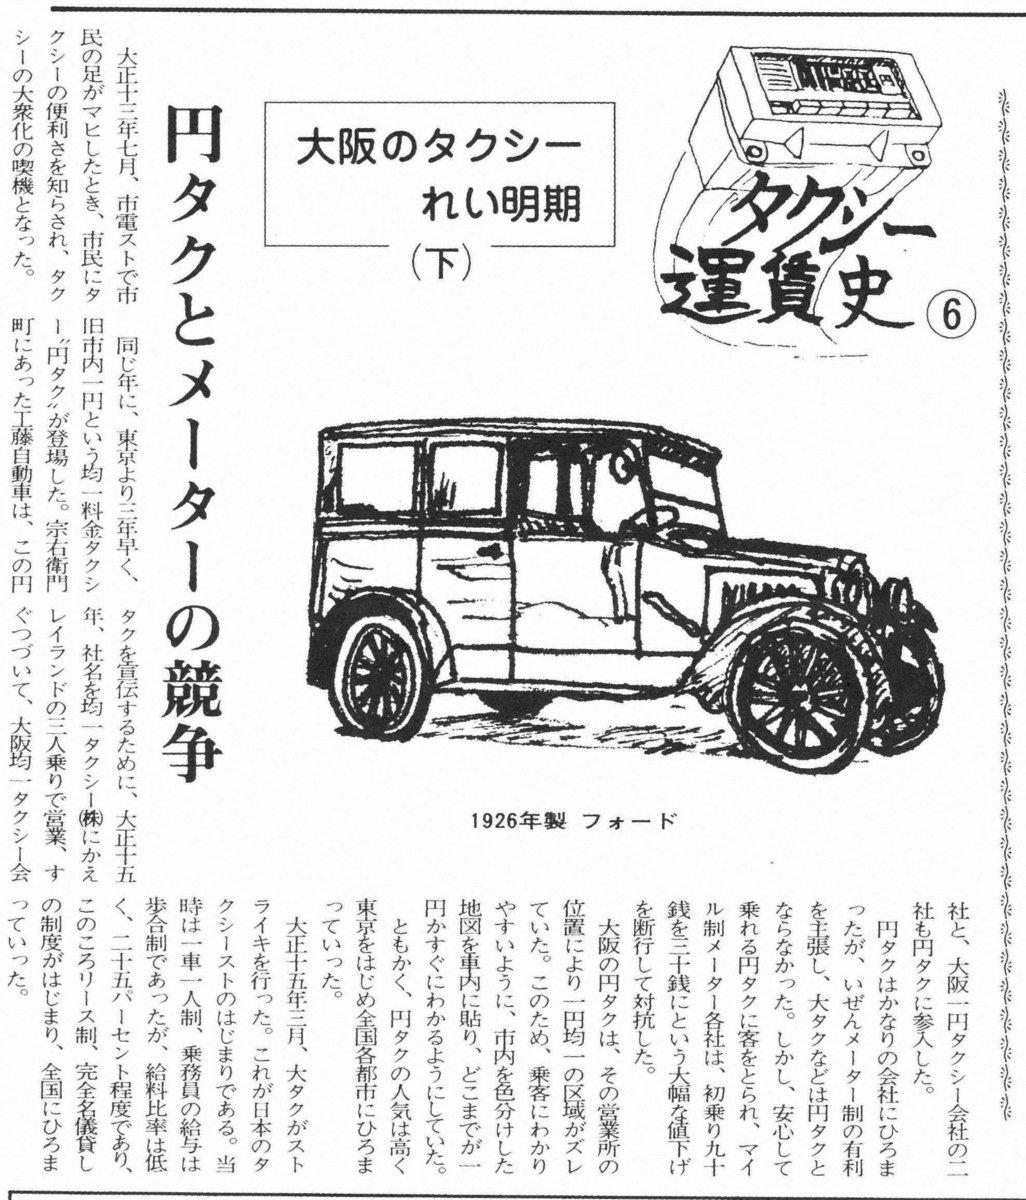 MK新聞 1982年8月16日号 掲載